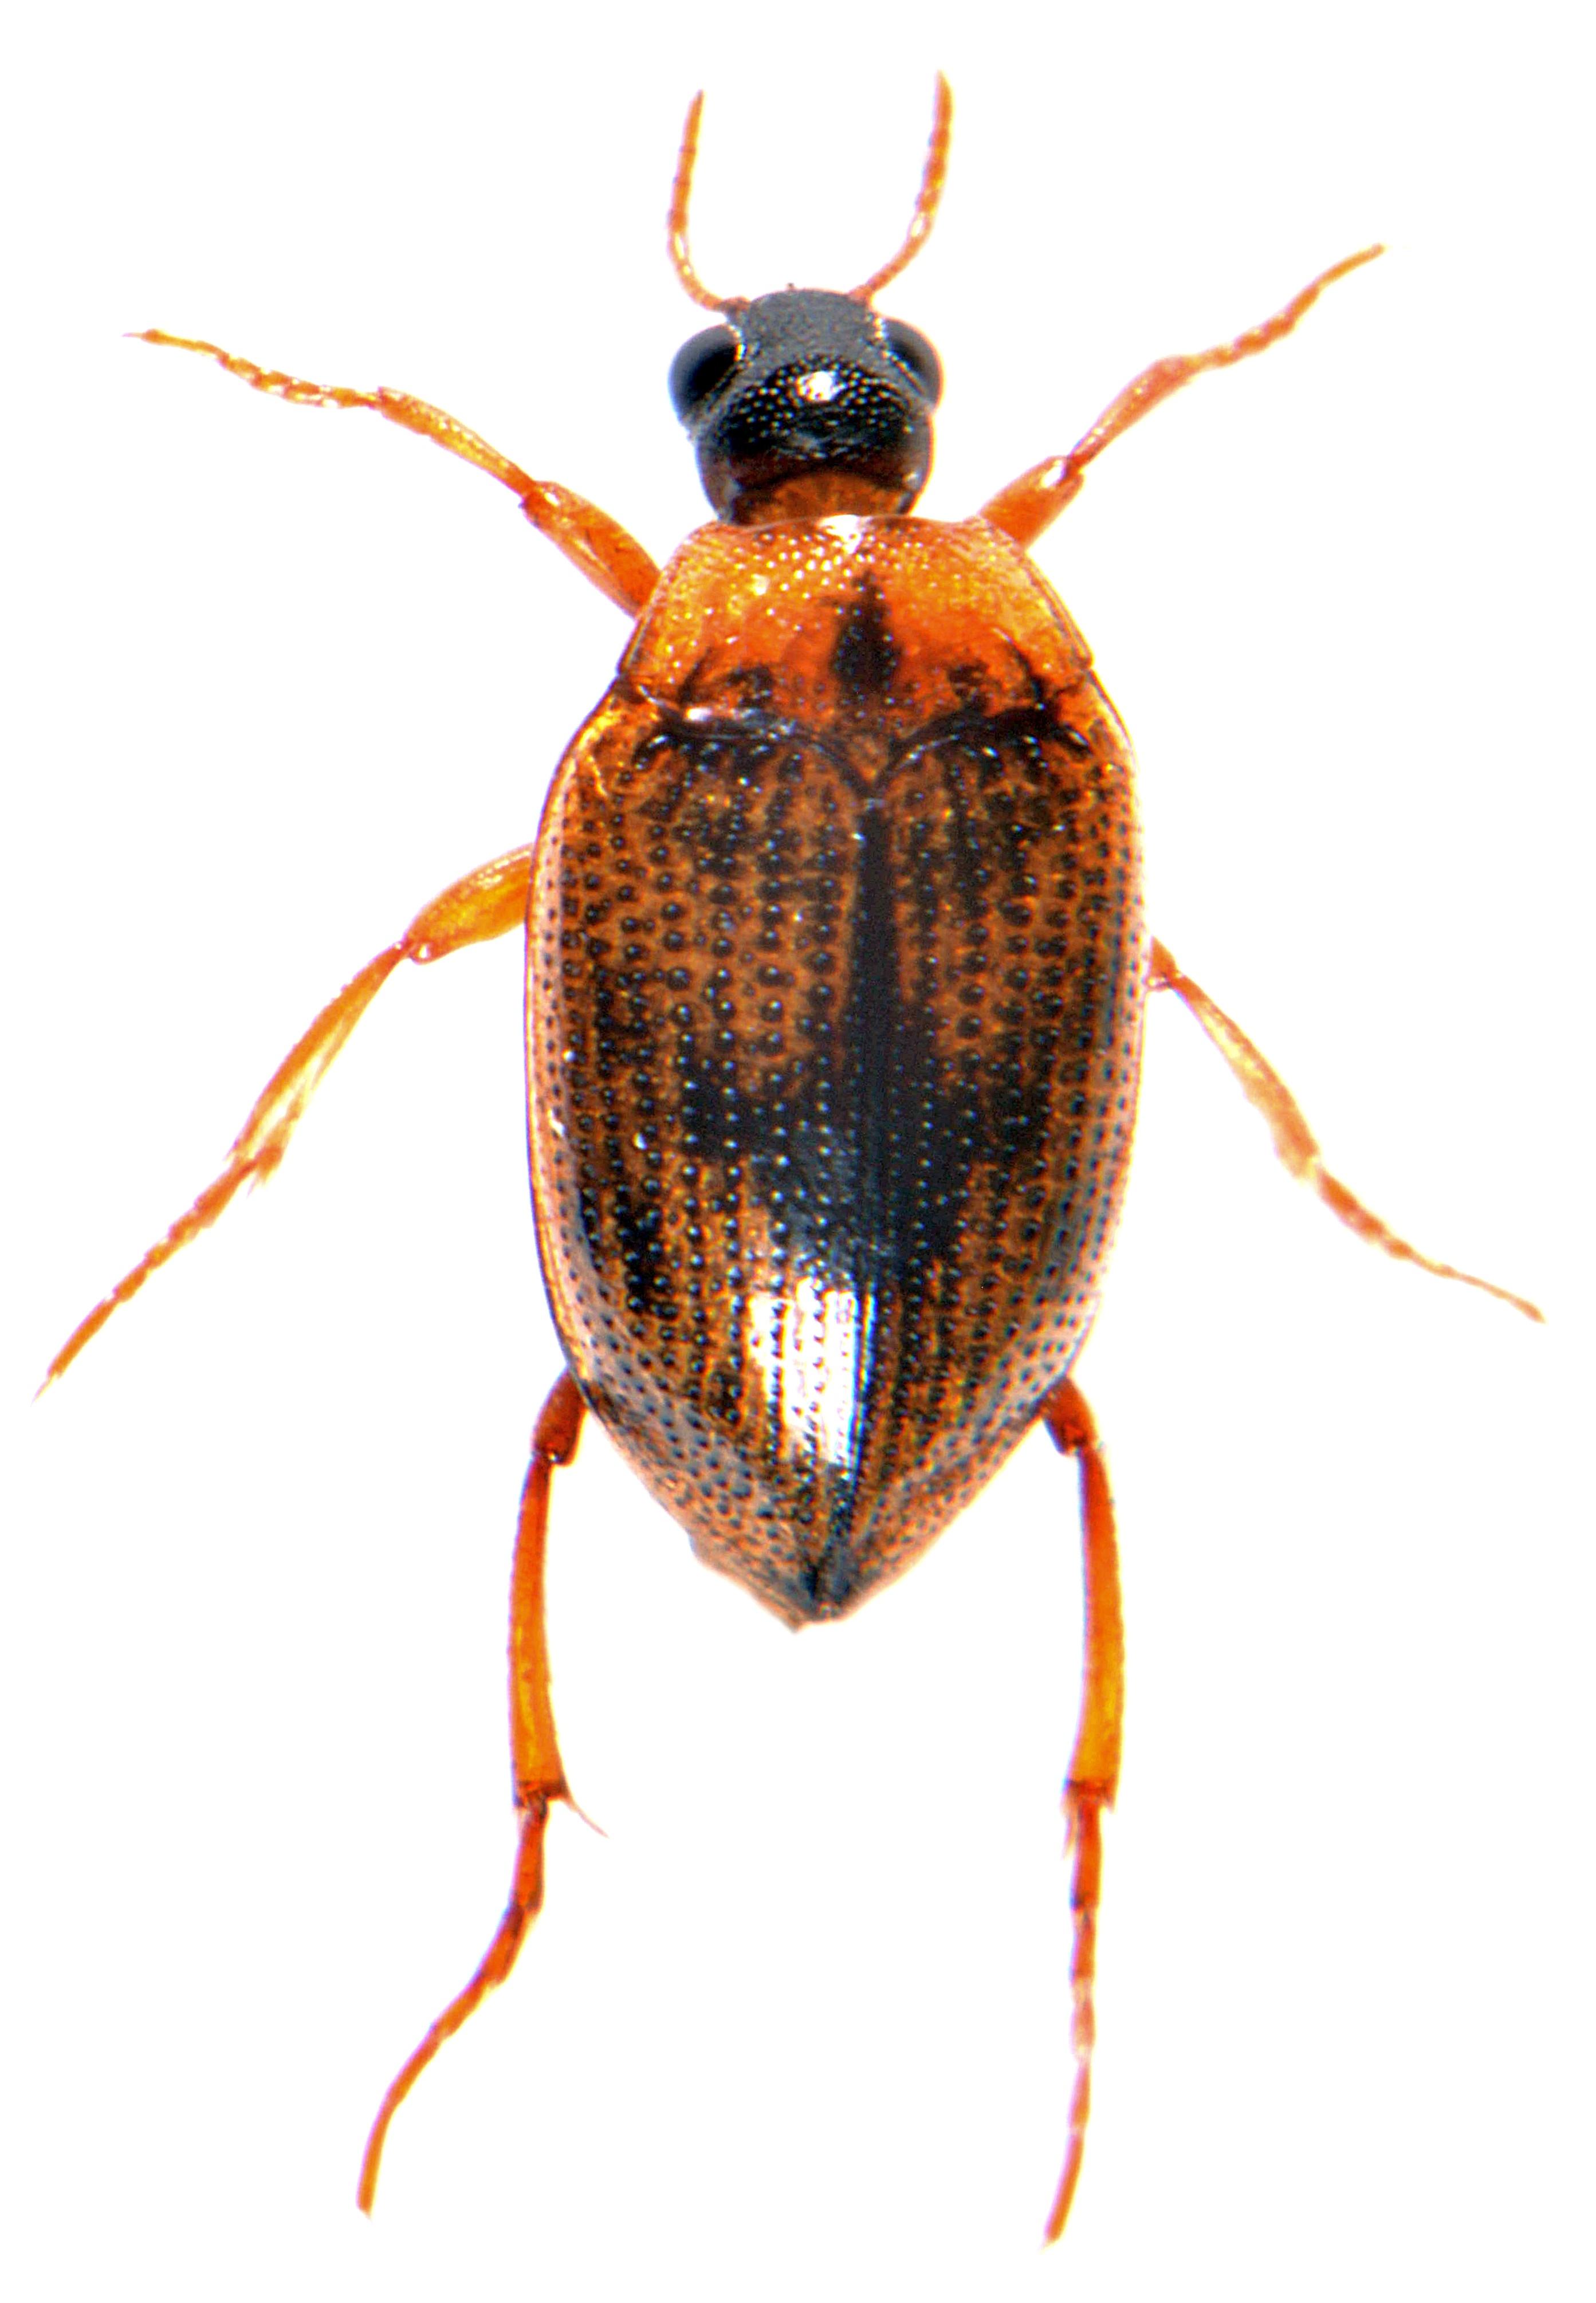 Haliplus lineatocollis 1